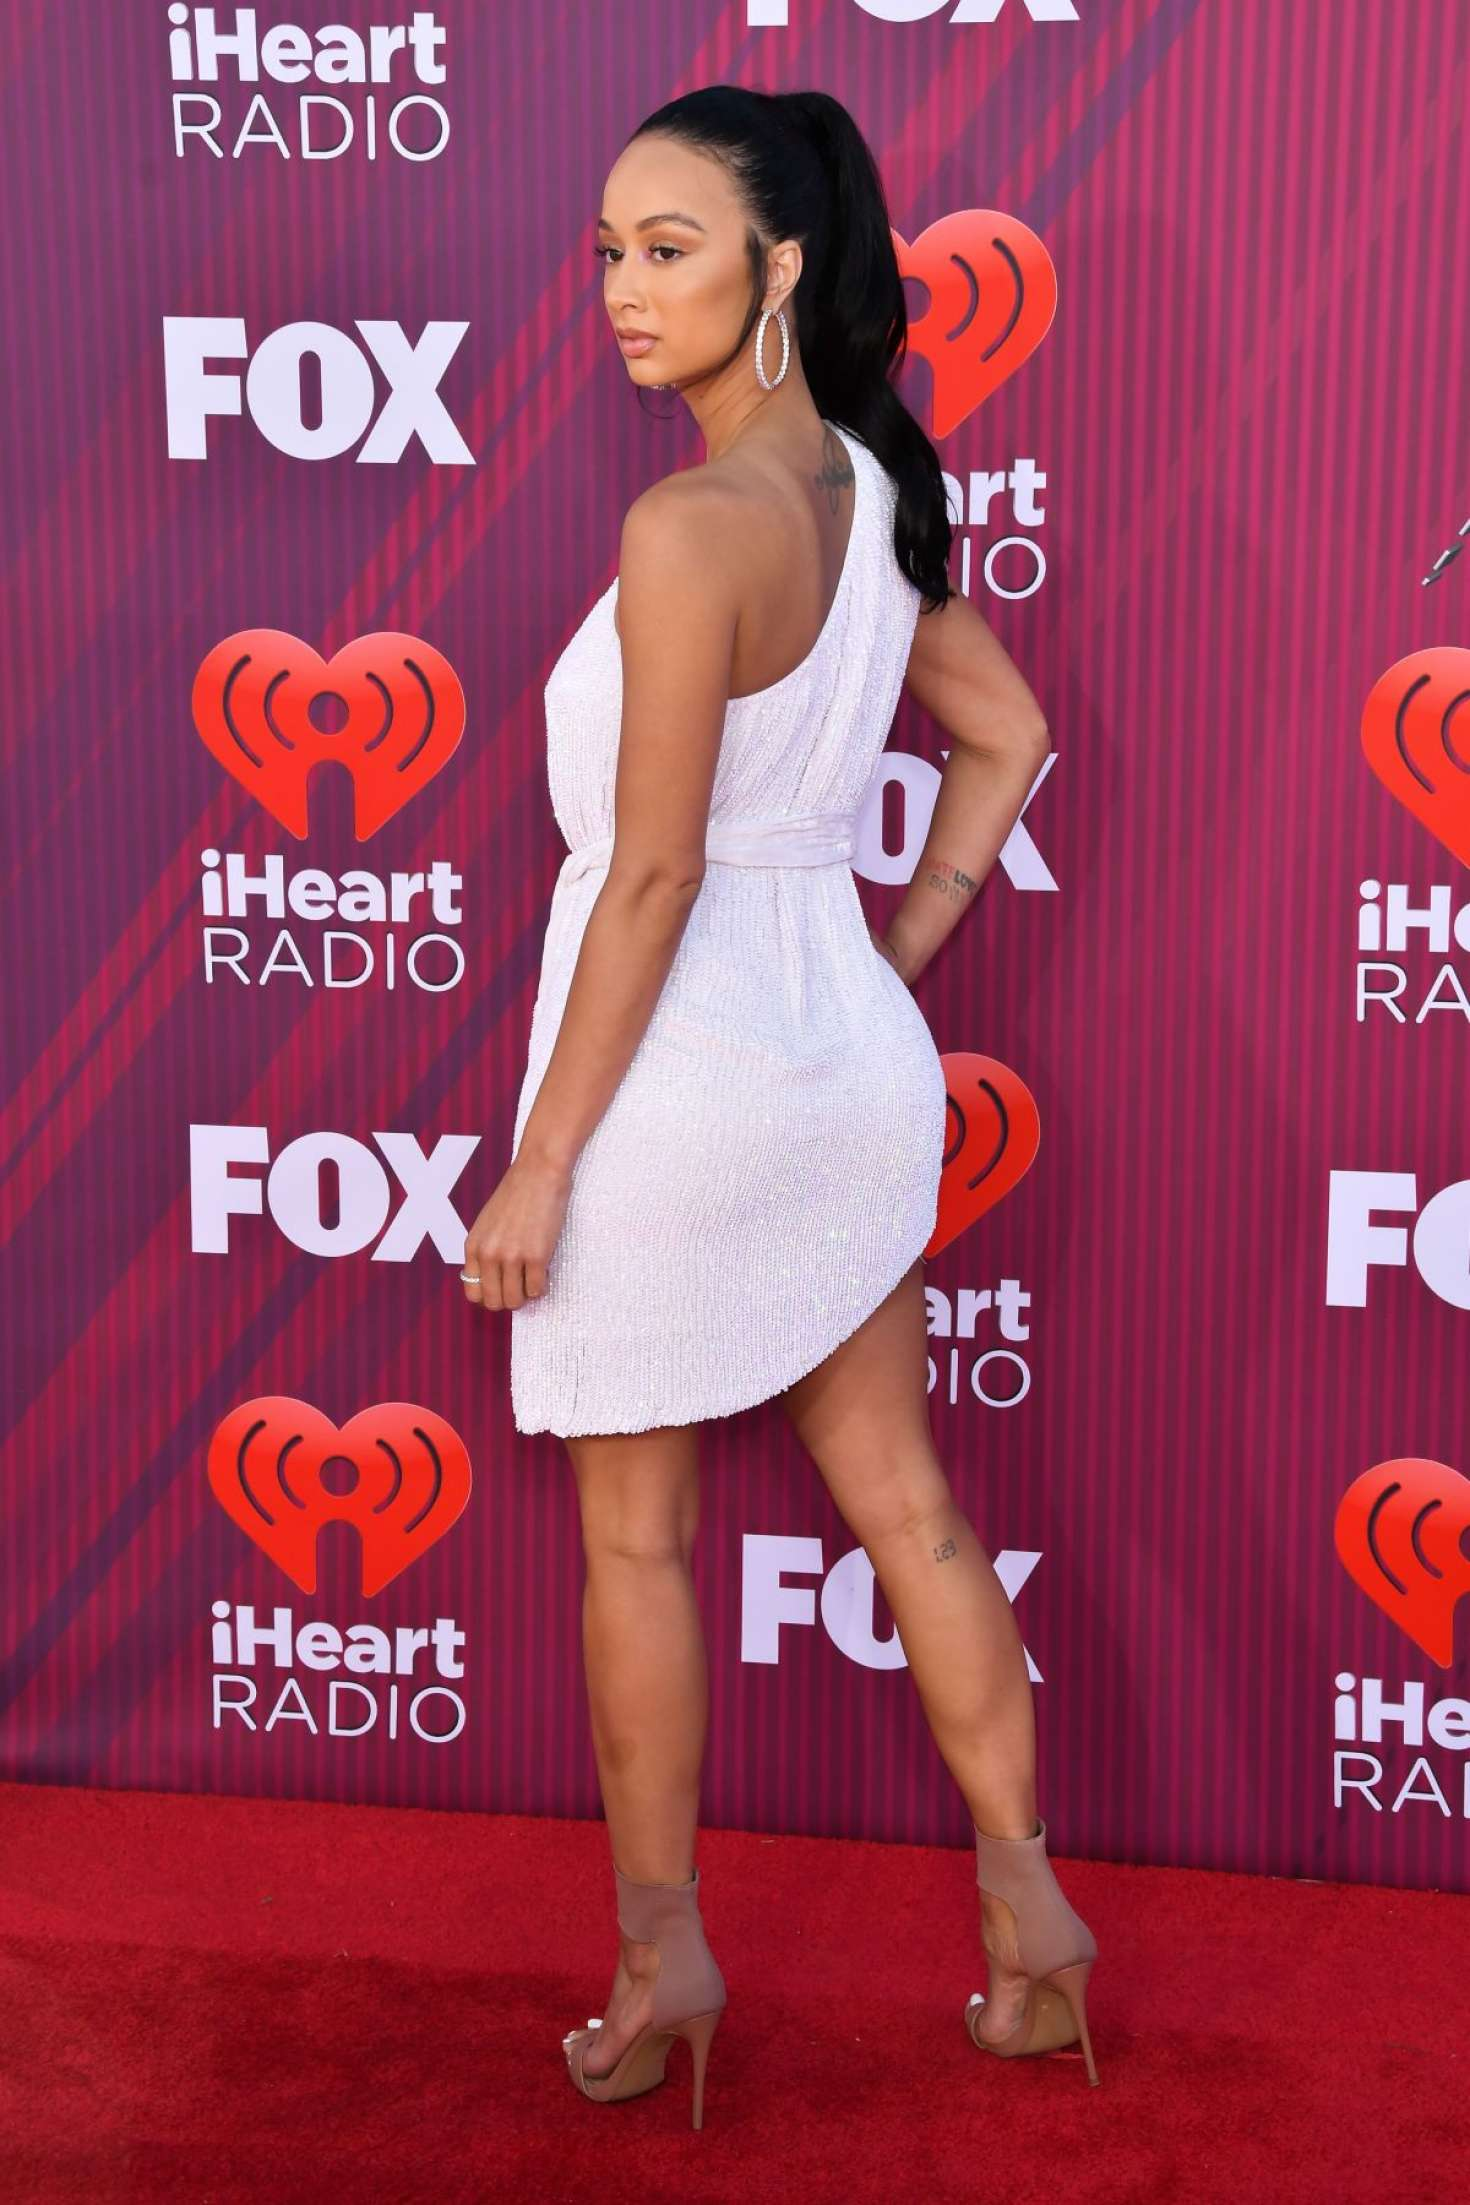 Draya Michele 2019 : Draya Michele: 2019 iHeartRadio Music Awards -02